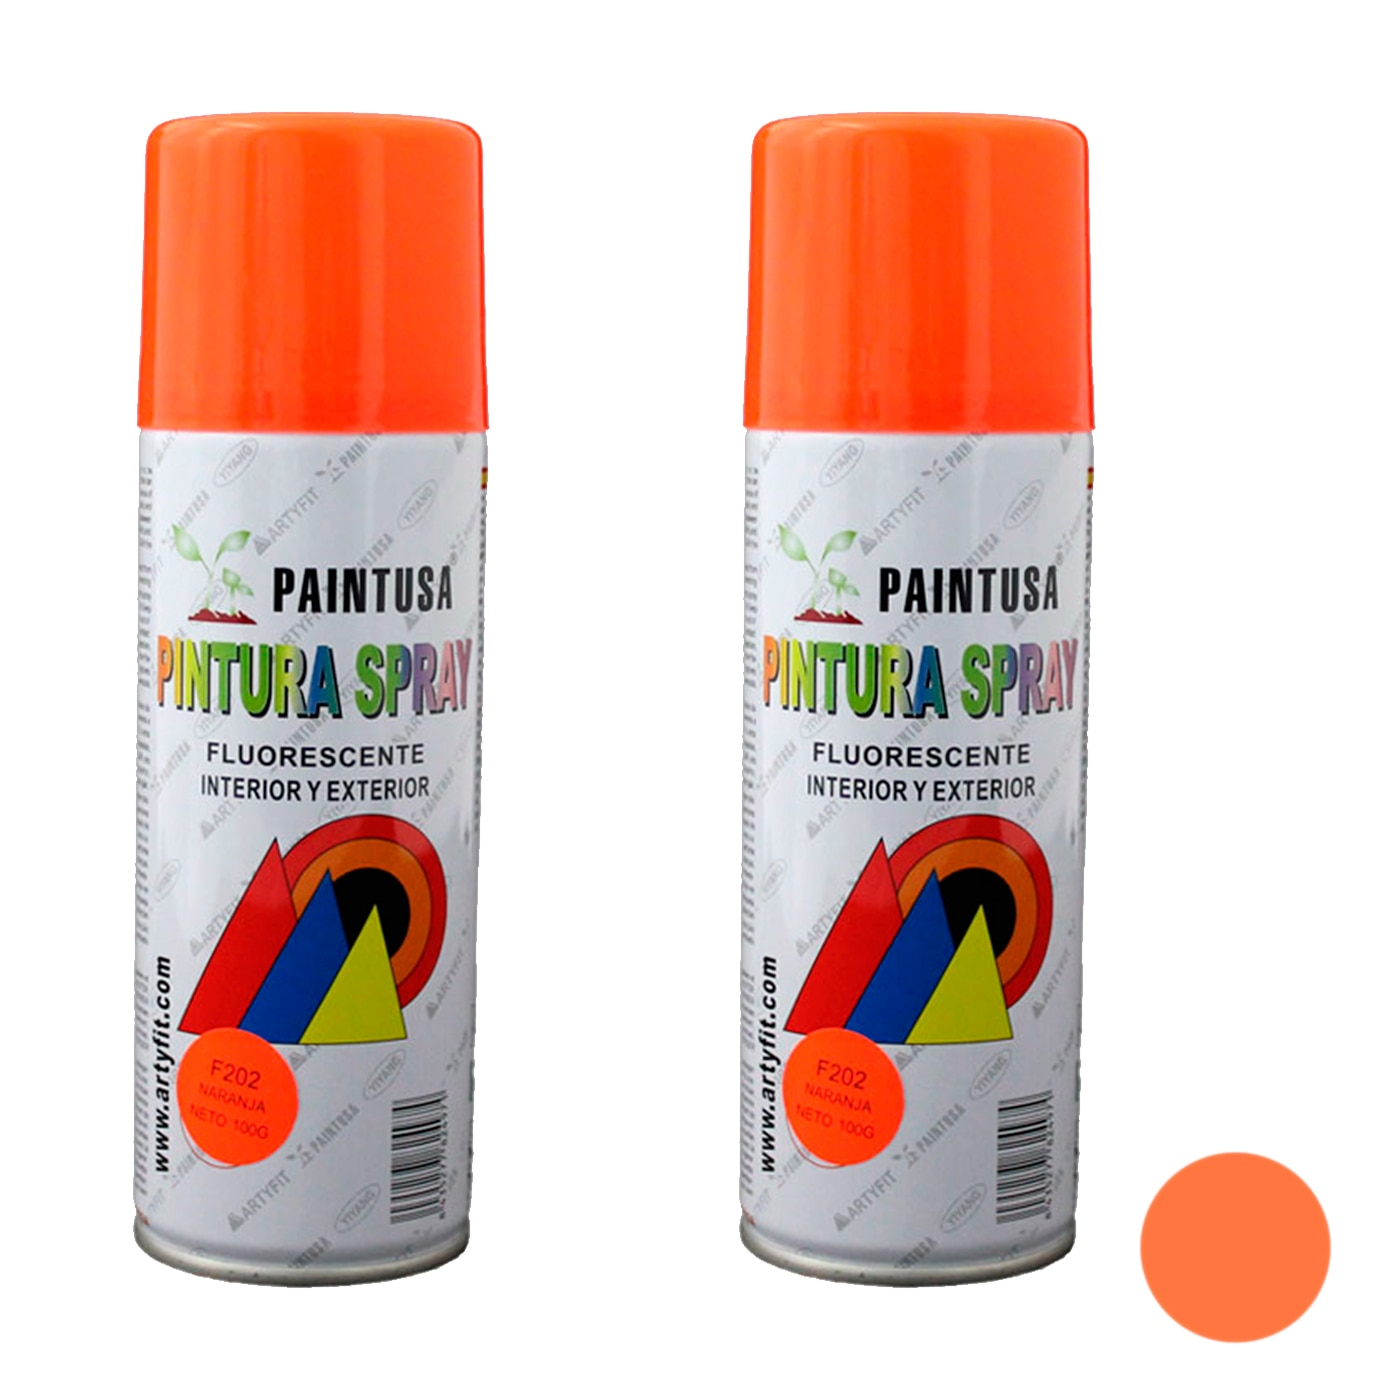 Paintusa-pack 2 F202 latas de spray de tinta Fluorescente Laranja 200 ml